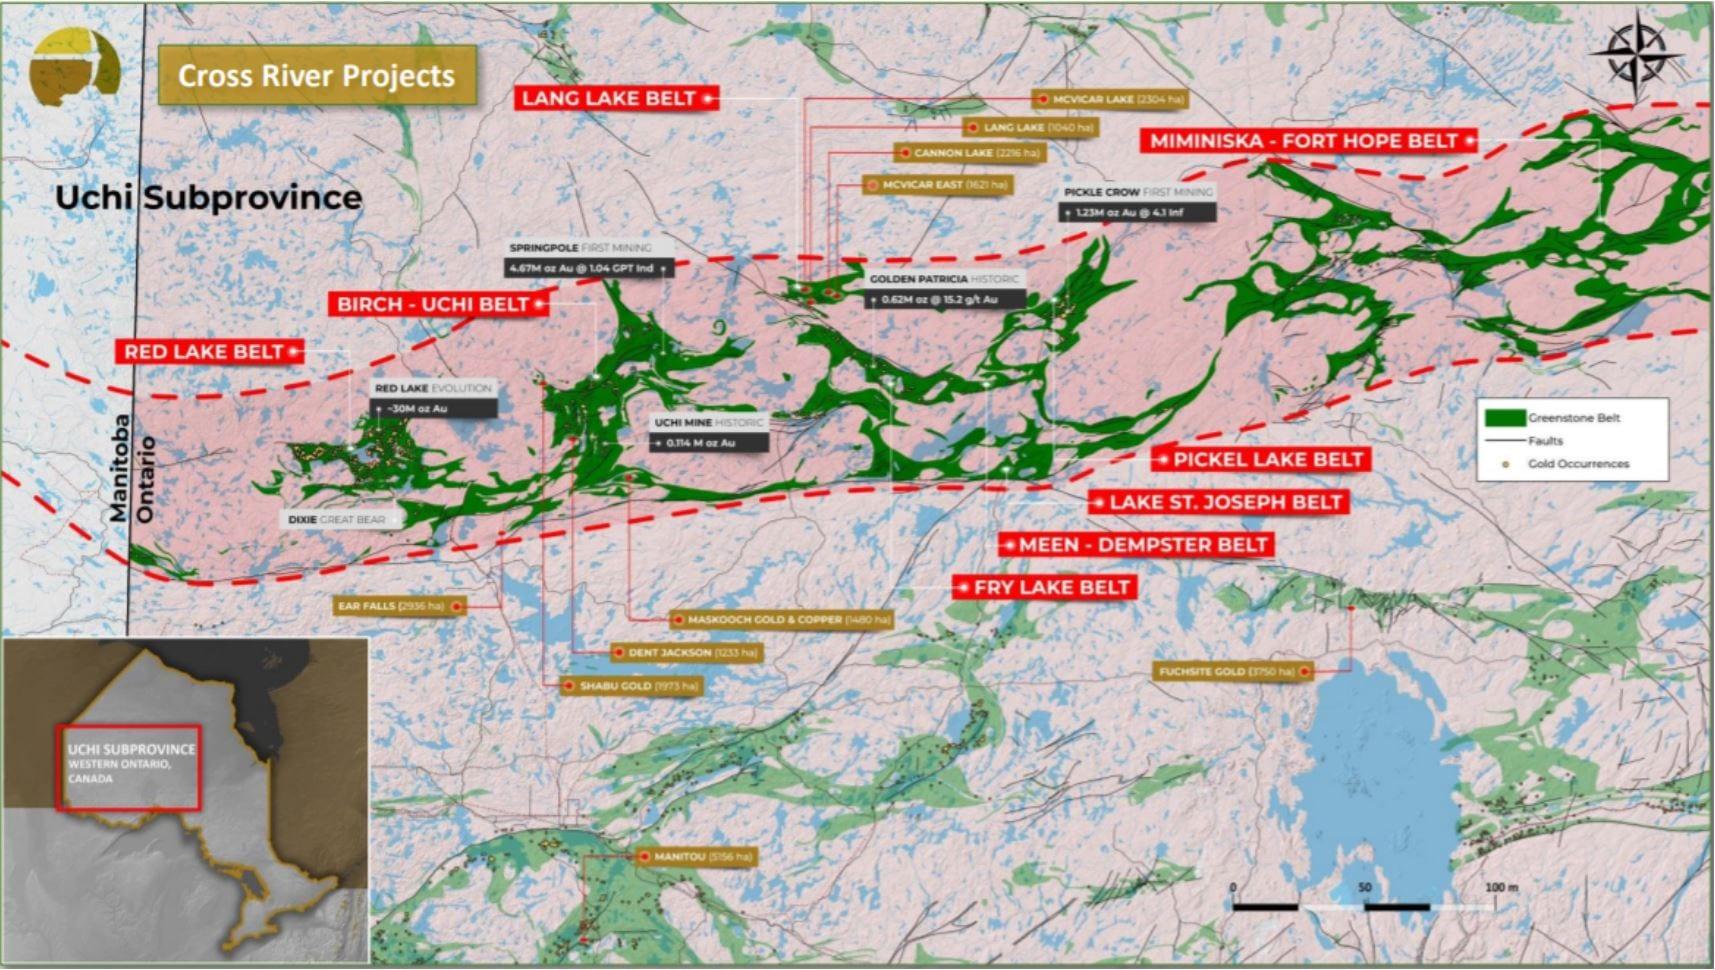 map of cross river ventures' uchi belt projects